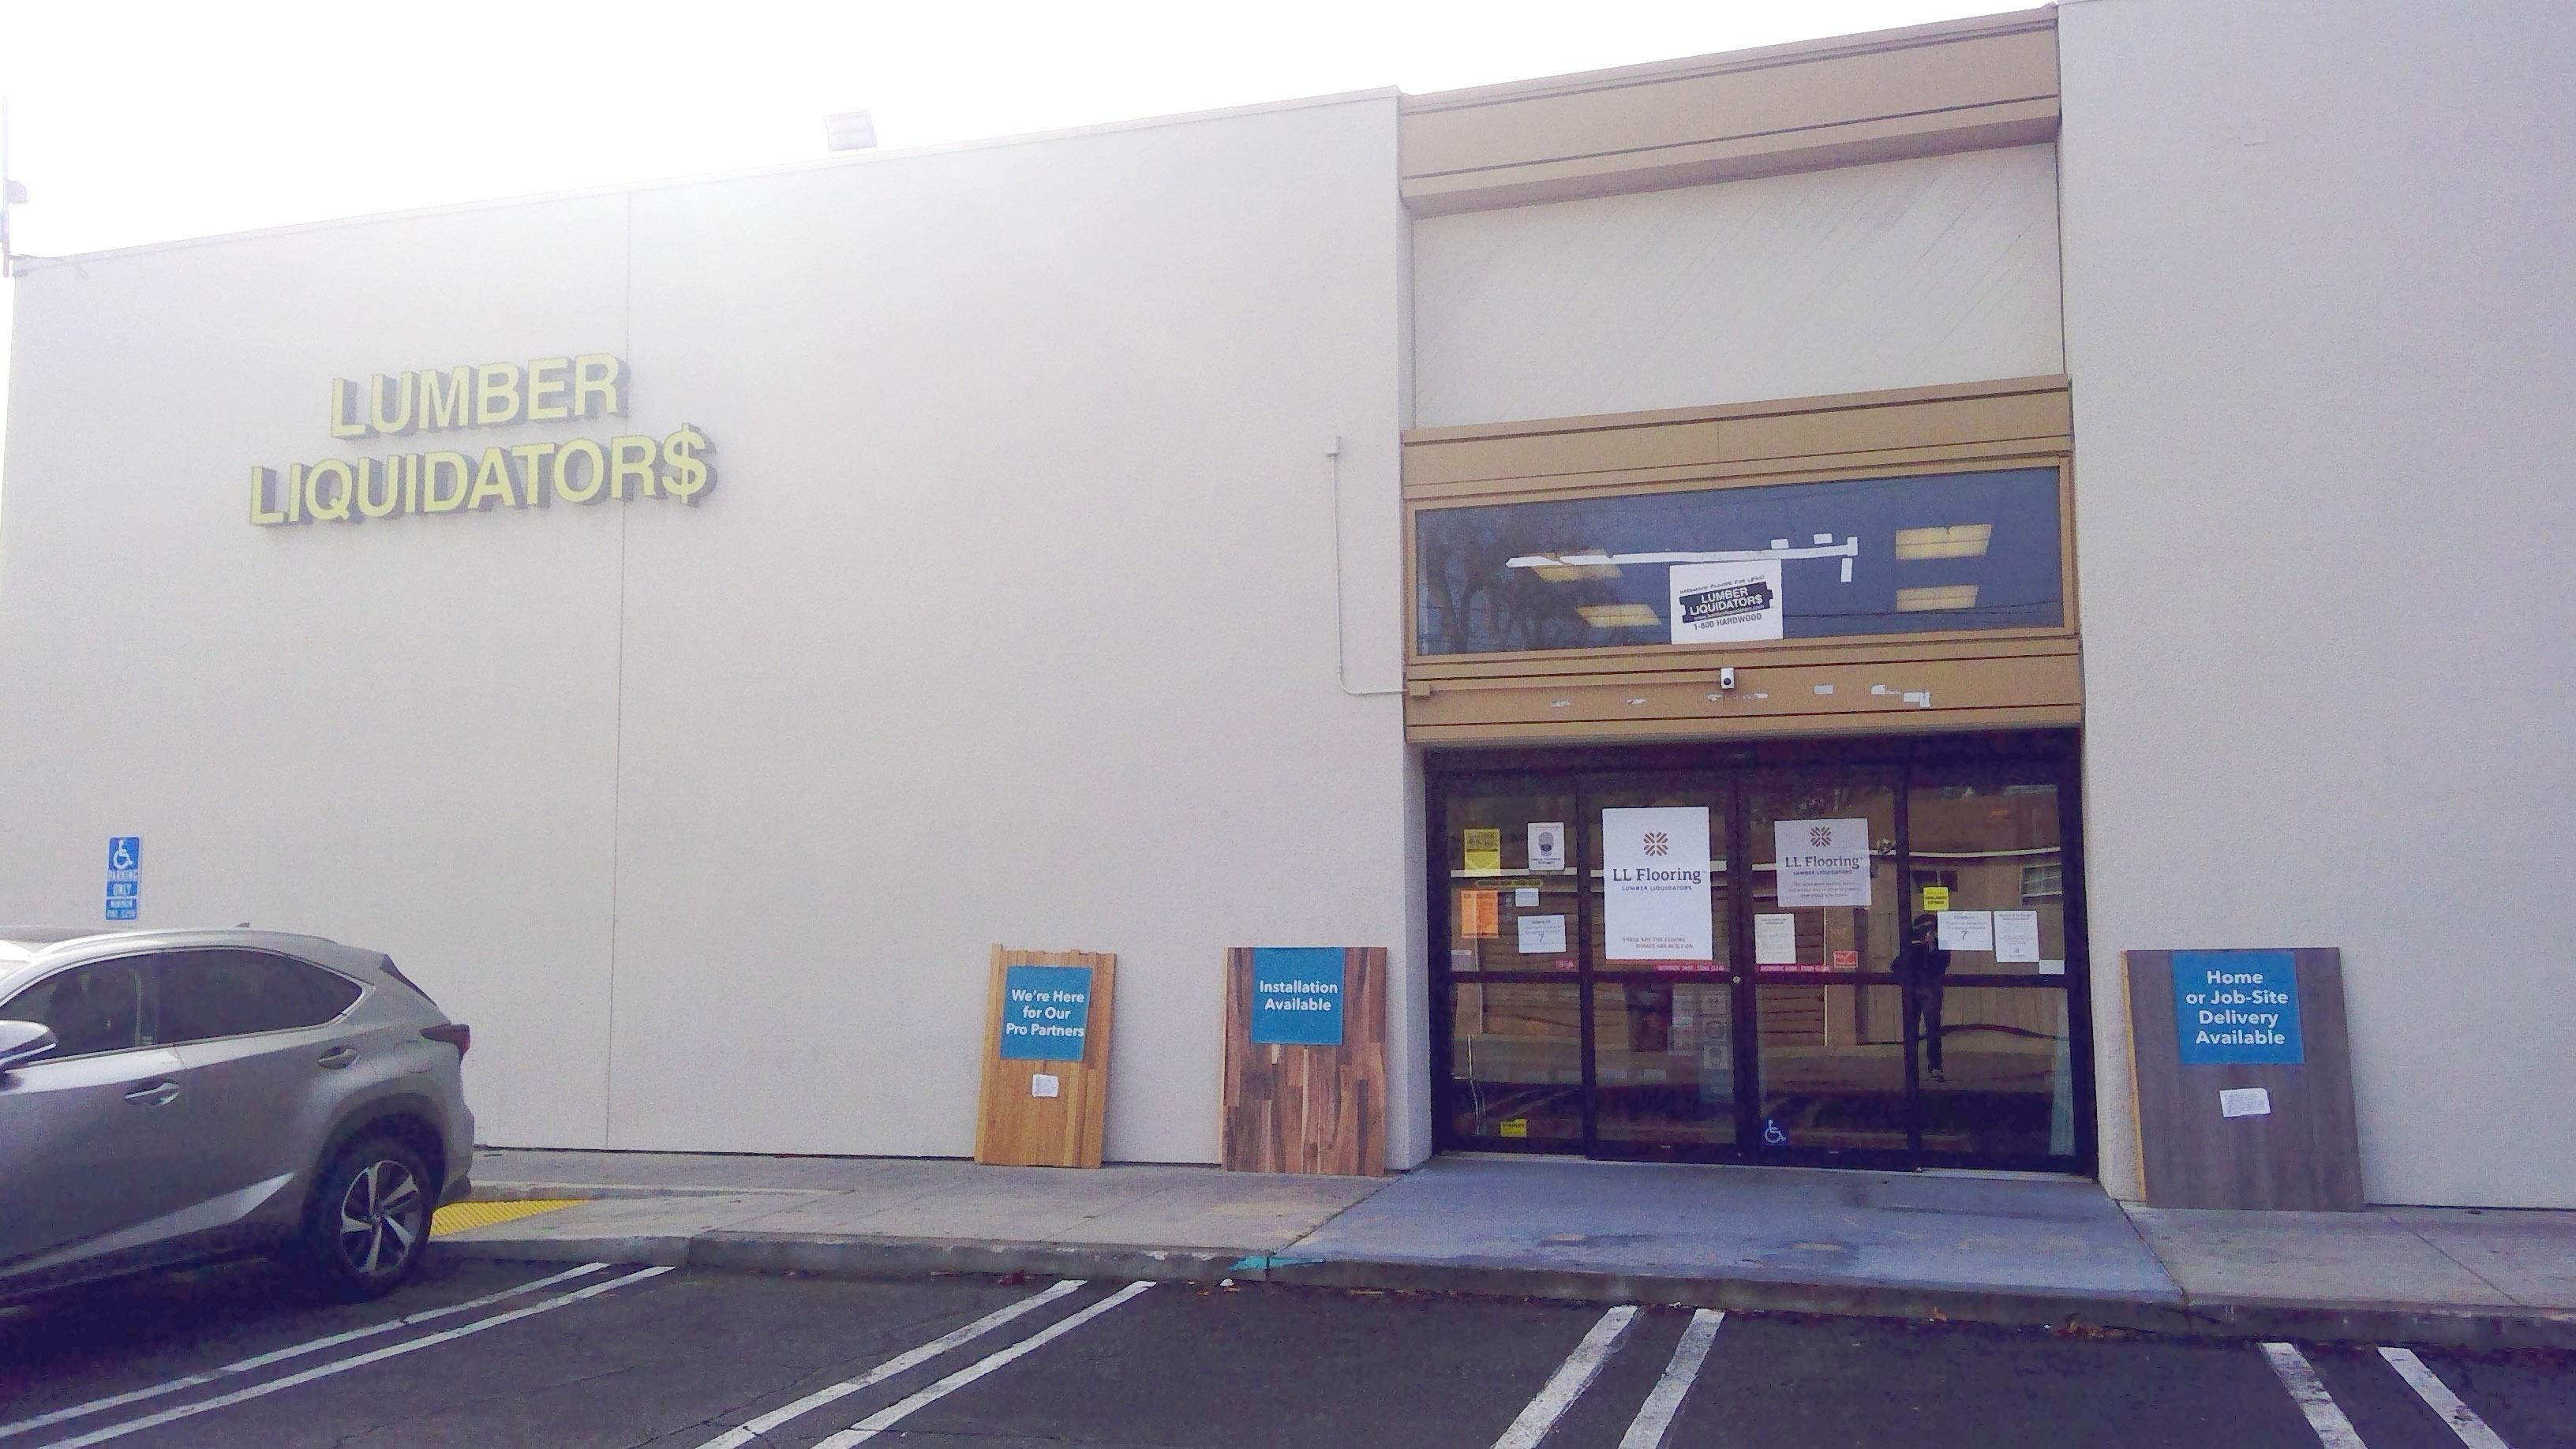 Ll Flooring Lumber Liquidators 1265 Lakewood 5832 Boulevard